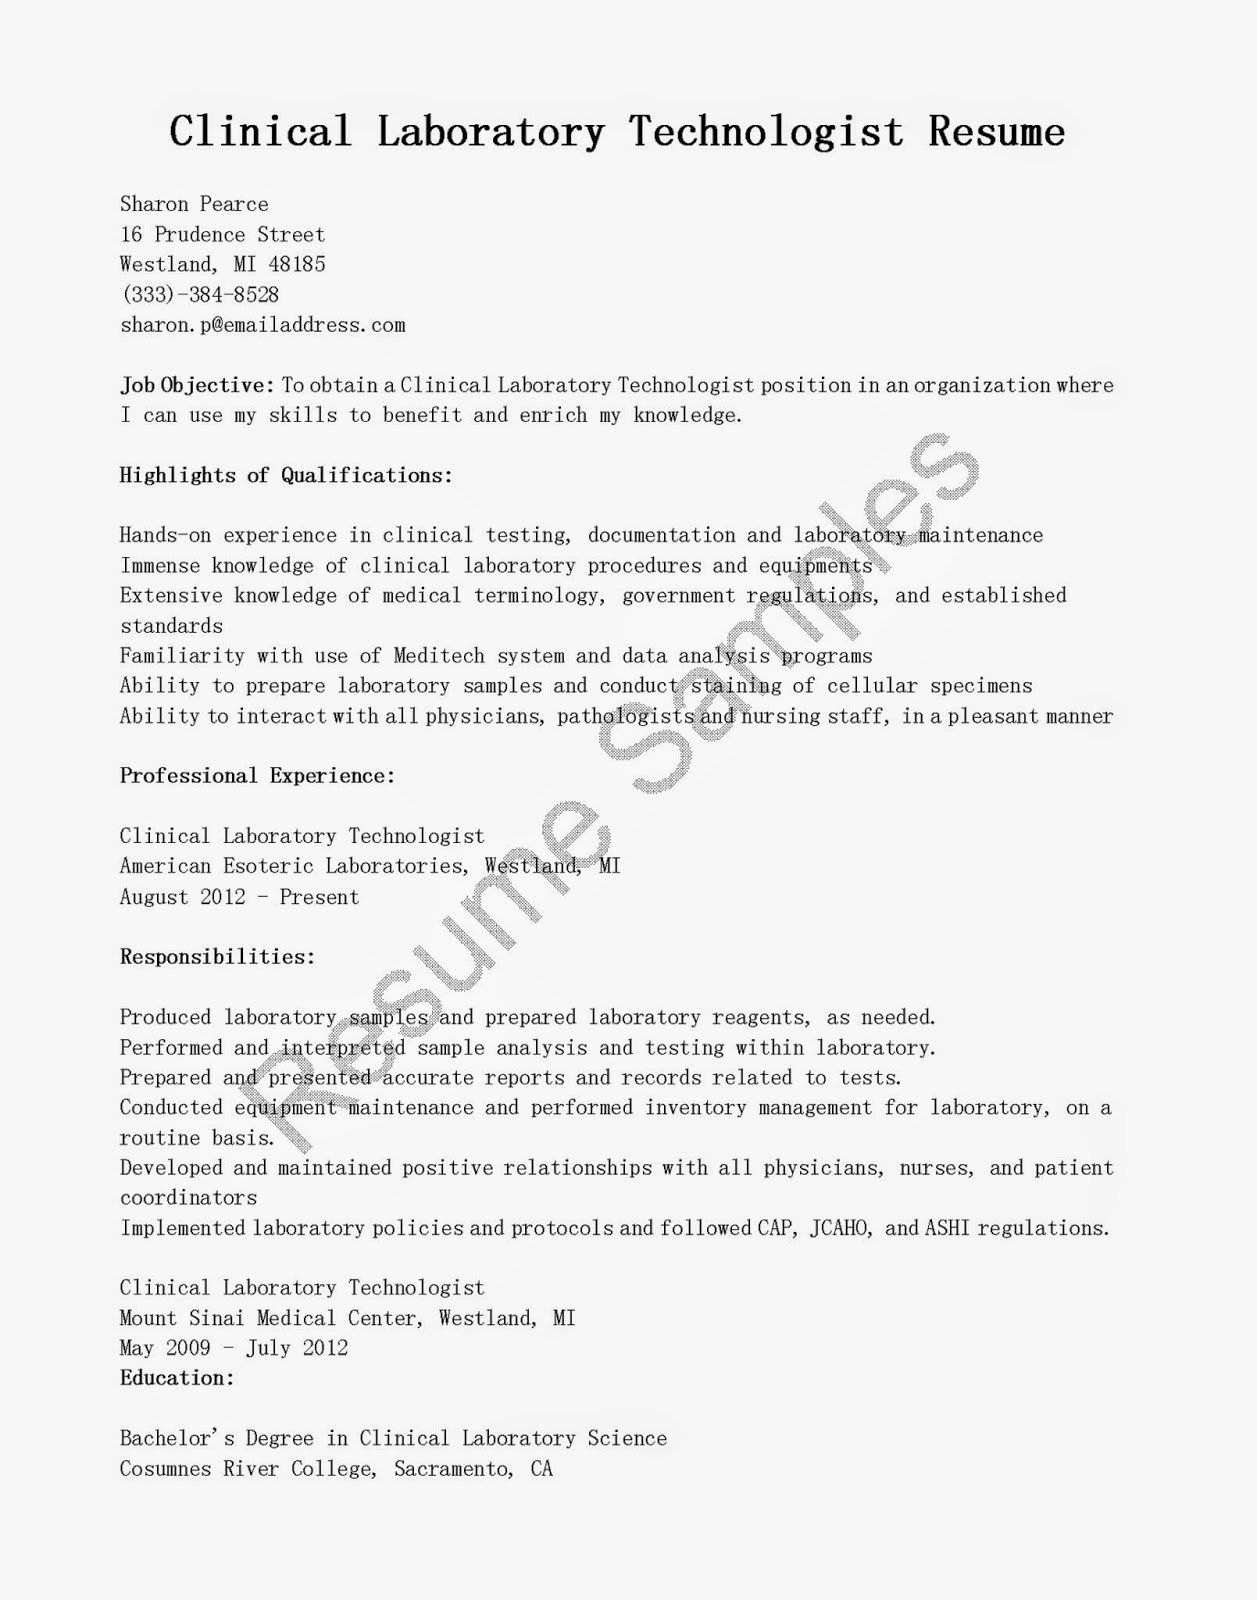 Clinical Laboratory Scientist Resume Fresh Resume Samples Clinical Laboratory Technologist Resume Sample Good Resume Examples Registered Nurse Resume Resume